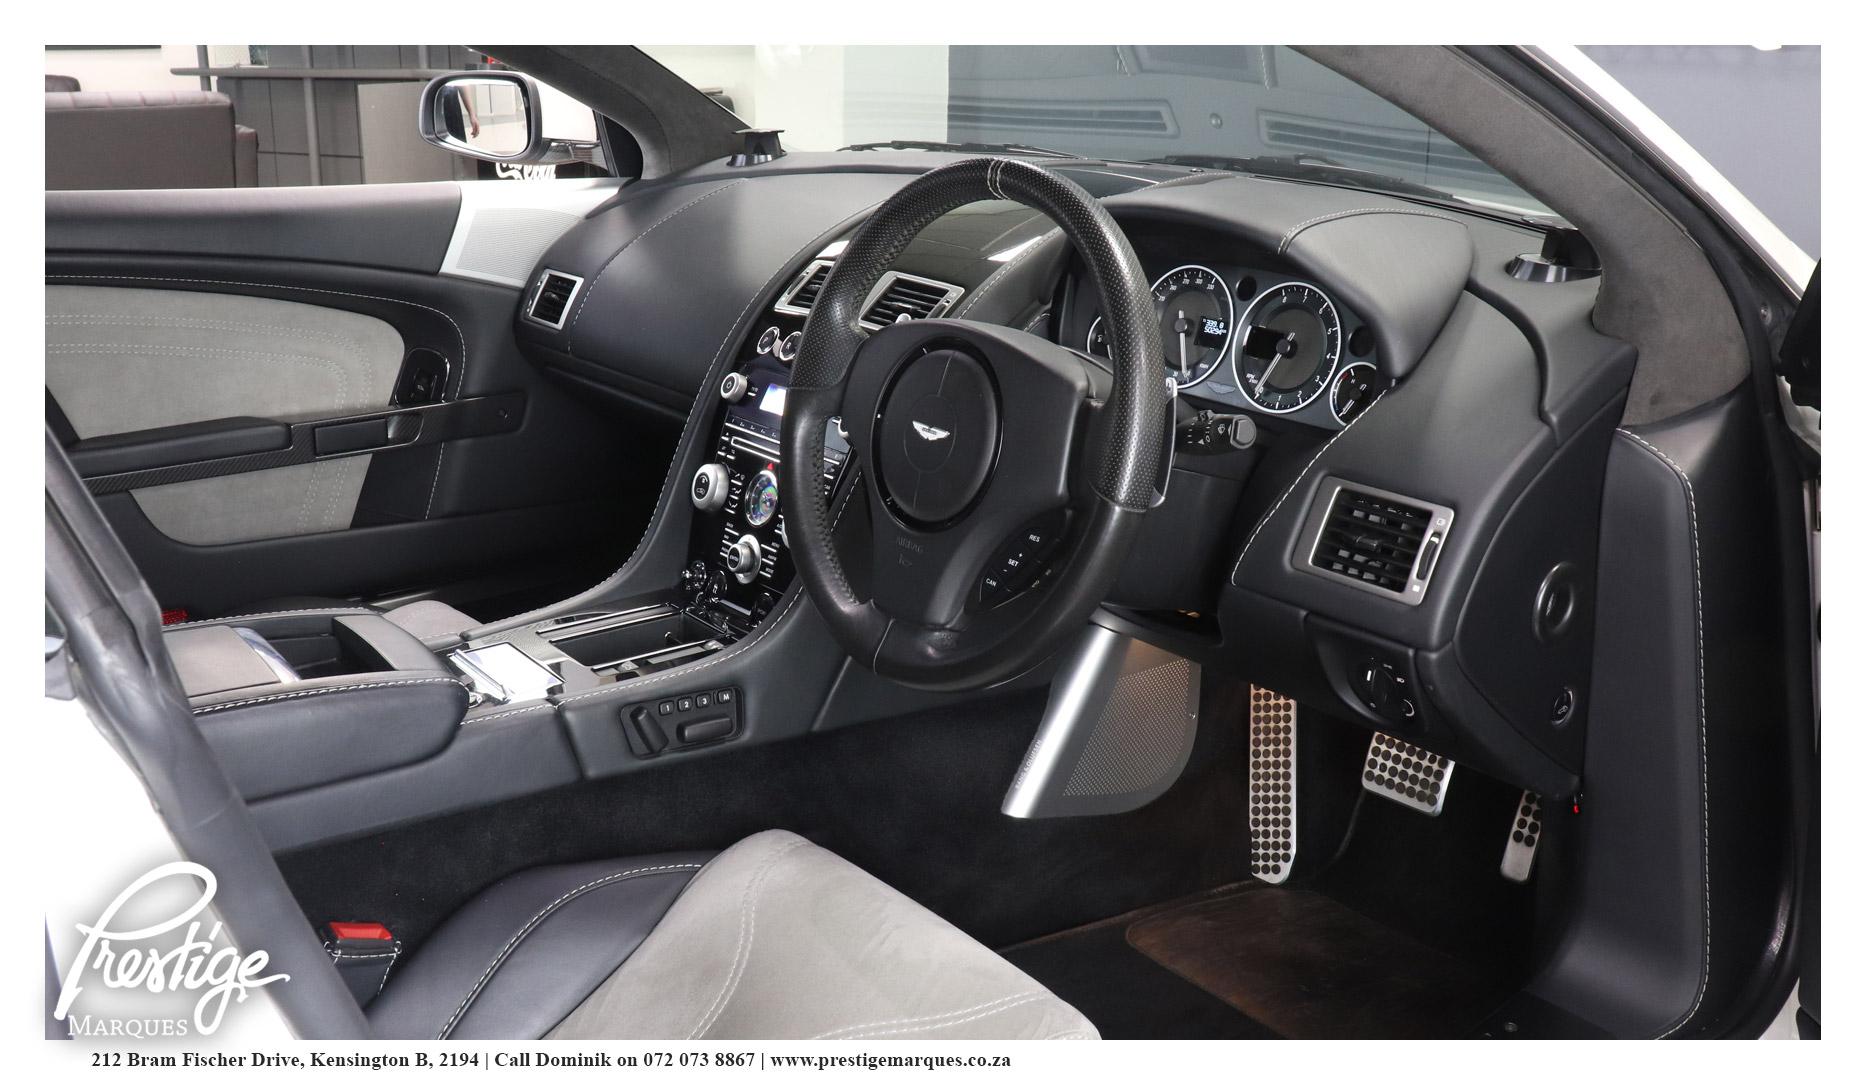 Aston-Martin-DBS-Coupe-Auto-2009-Prestige-Marques-Randburg-Sandton-11